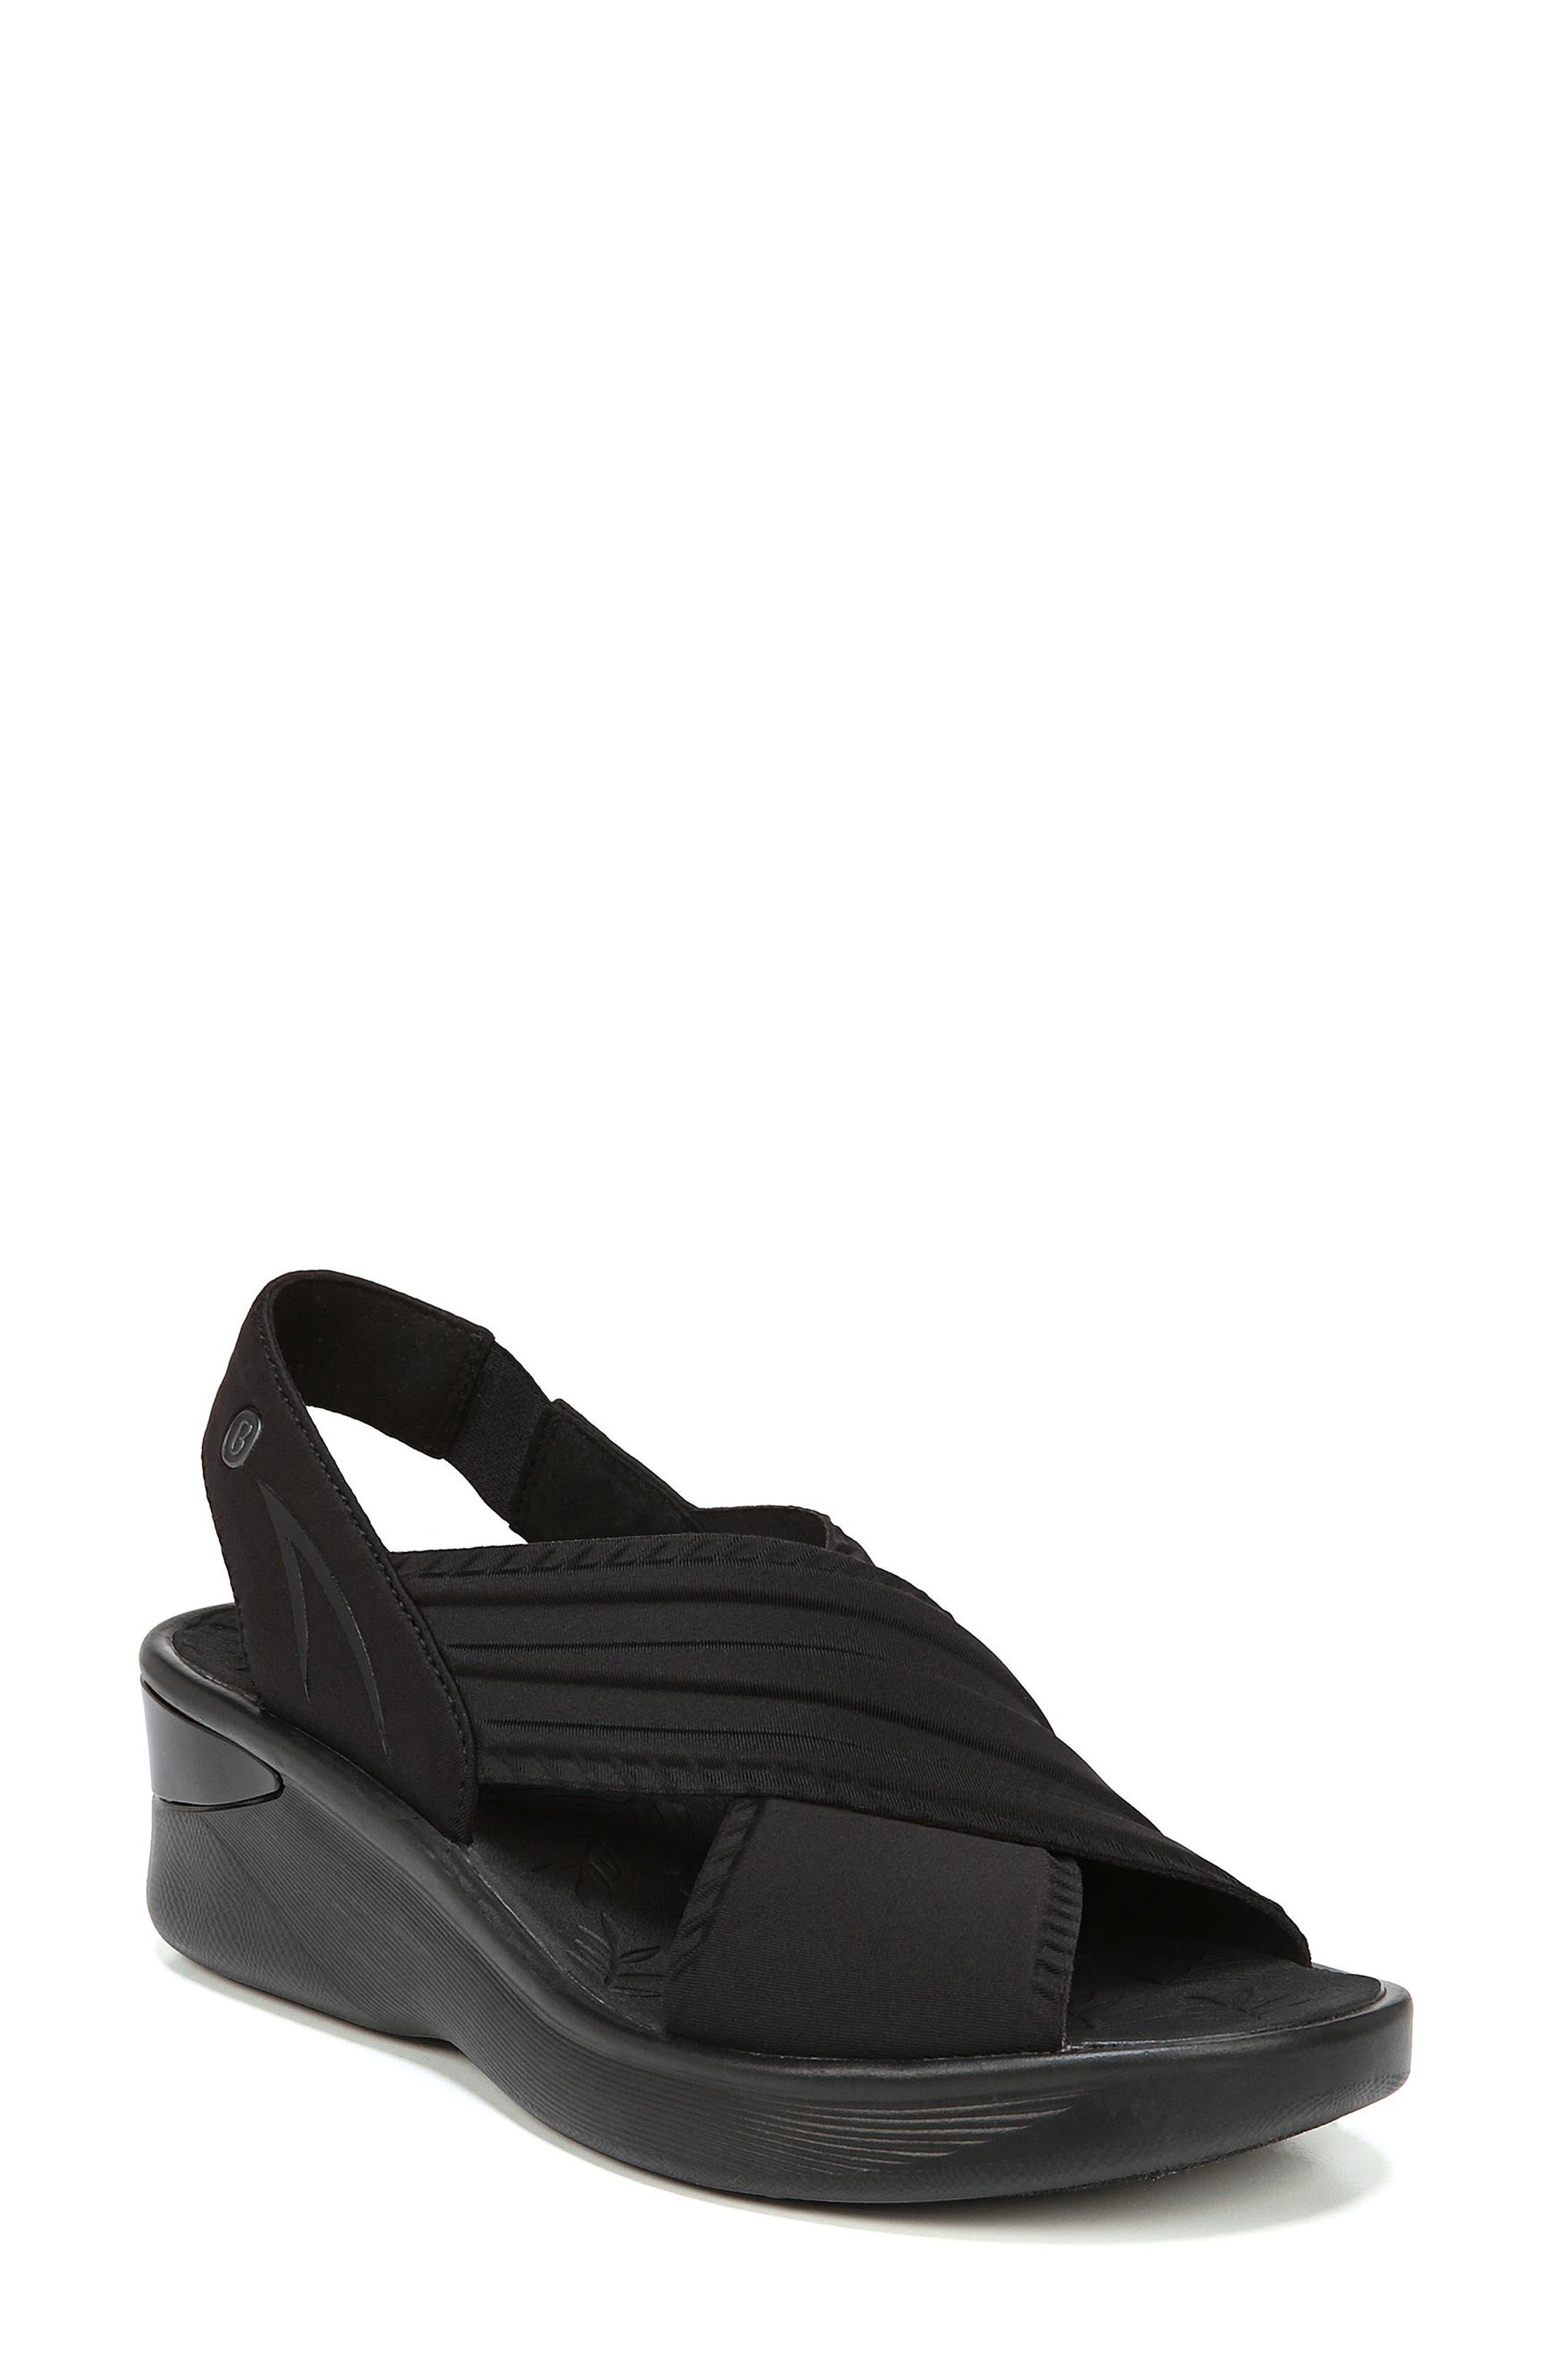 Sunset Wedge Sandal,                         Main,                         color, BLACK FABRIC